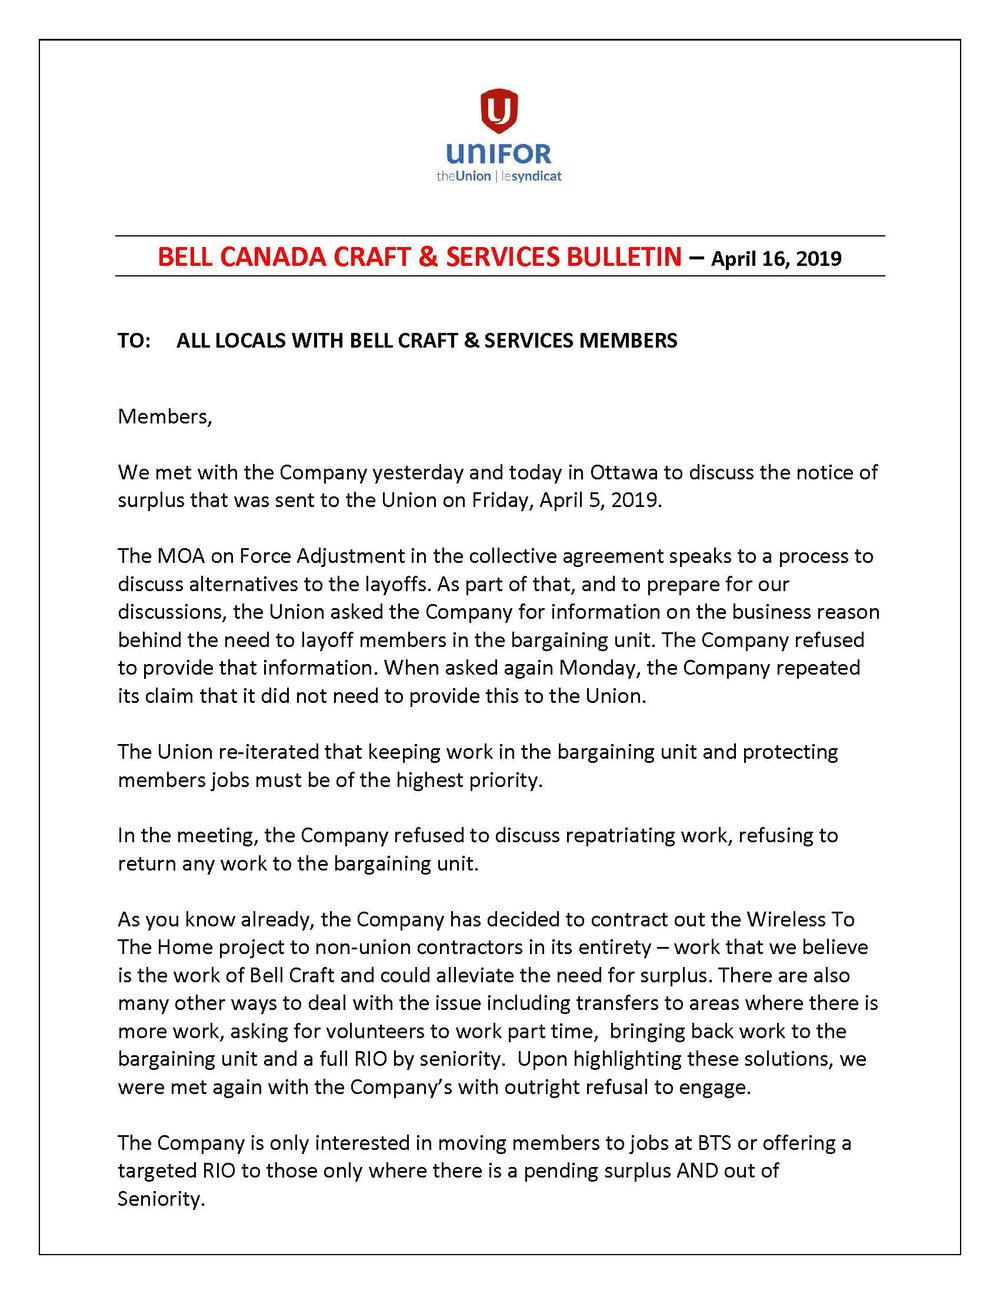 Bell Canada Craft  Services  Bulletin -  April 16-1.jpg